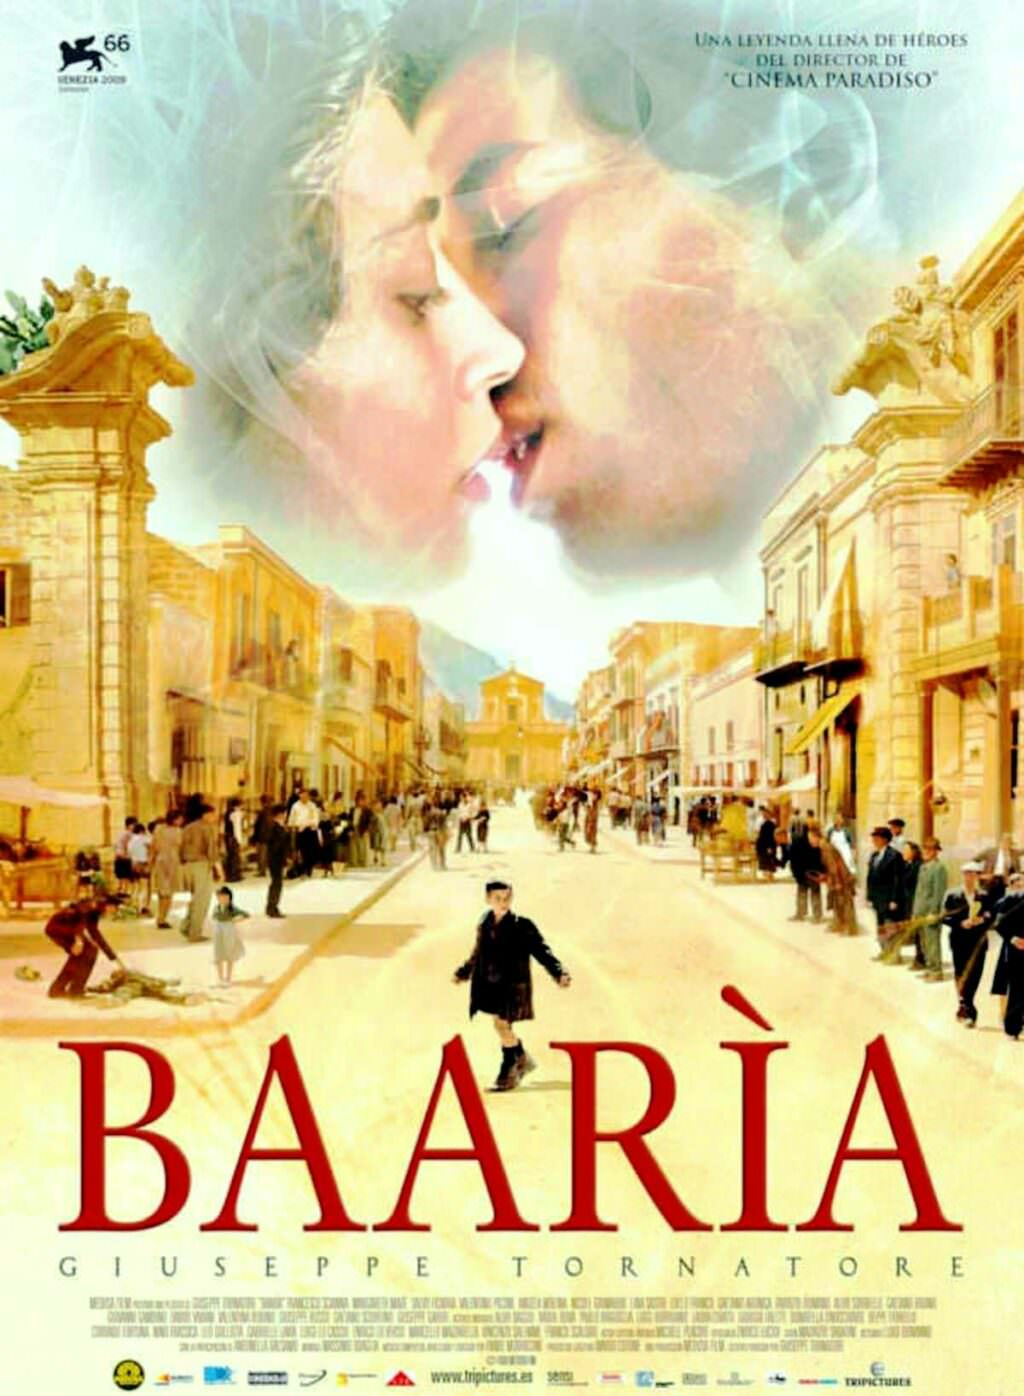 Baaria, un film racconto di un secolo di storia